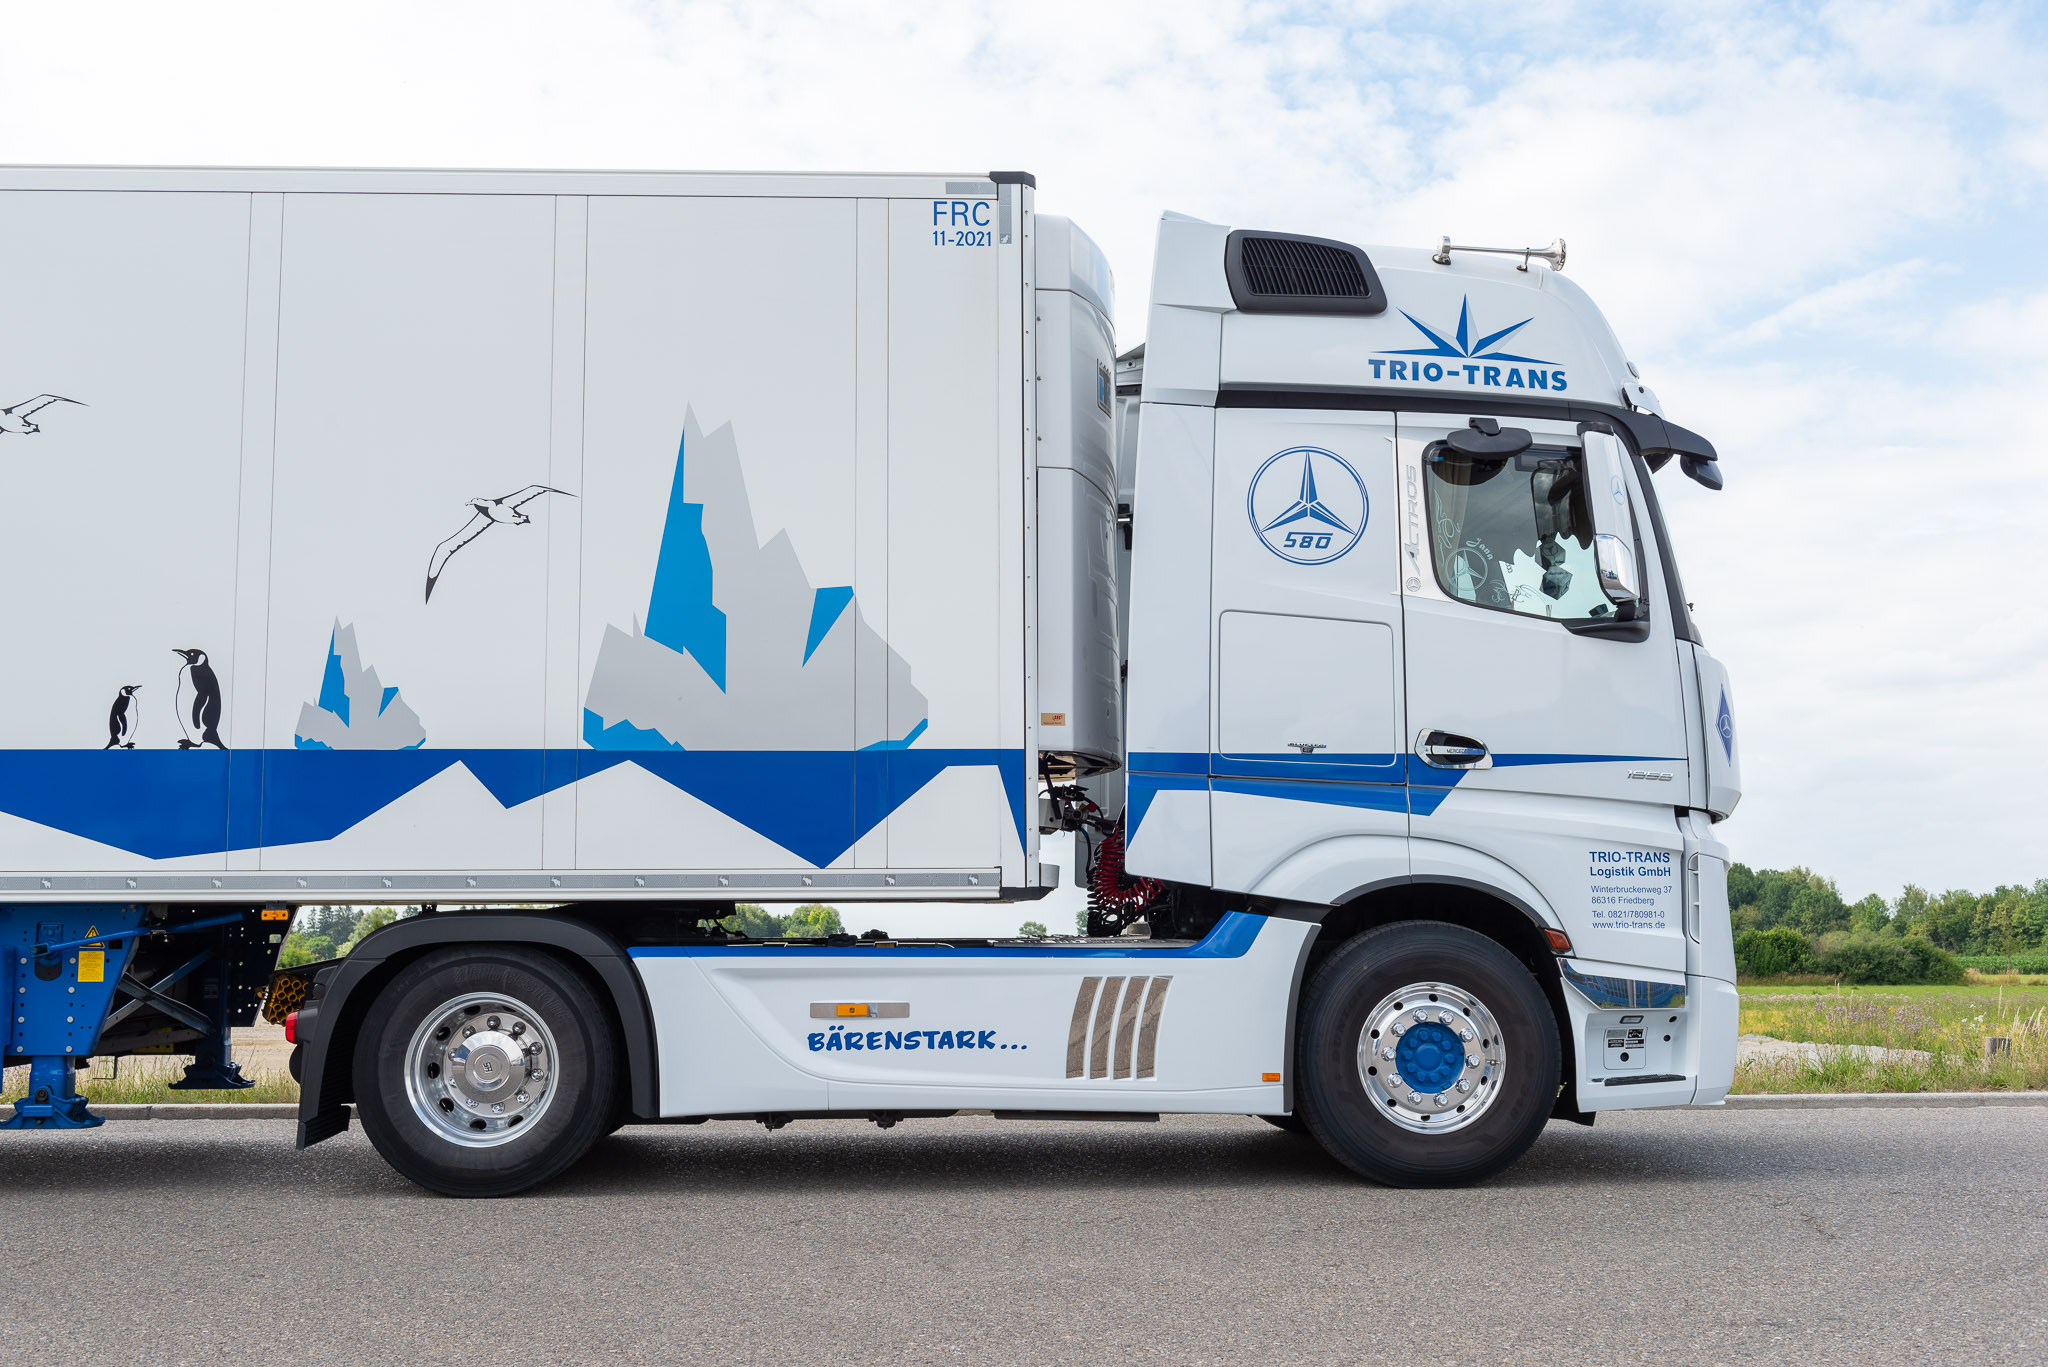 180624-Trio Trans Logistik Trucks-1659-2048.jpg